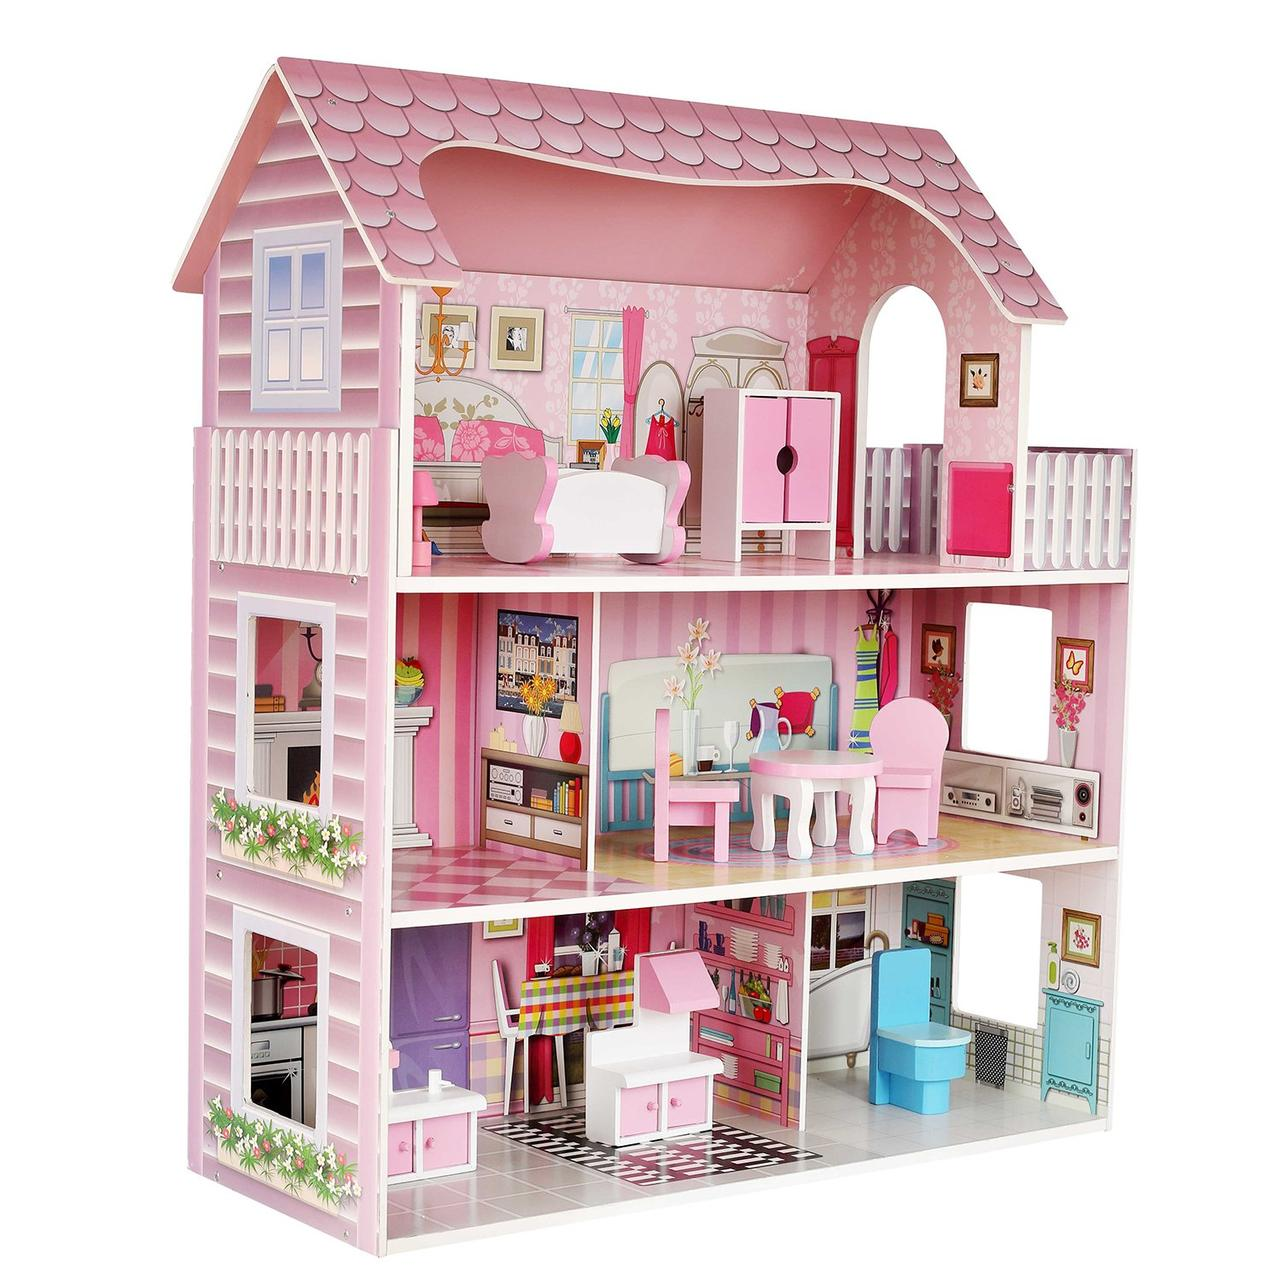 Дом для кукол Demi Star с аксессуарами 9 шт.